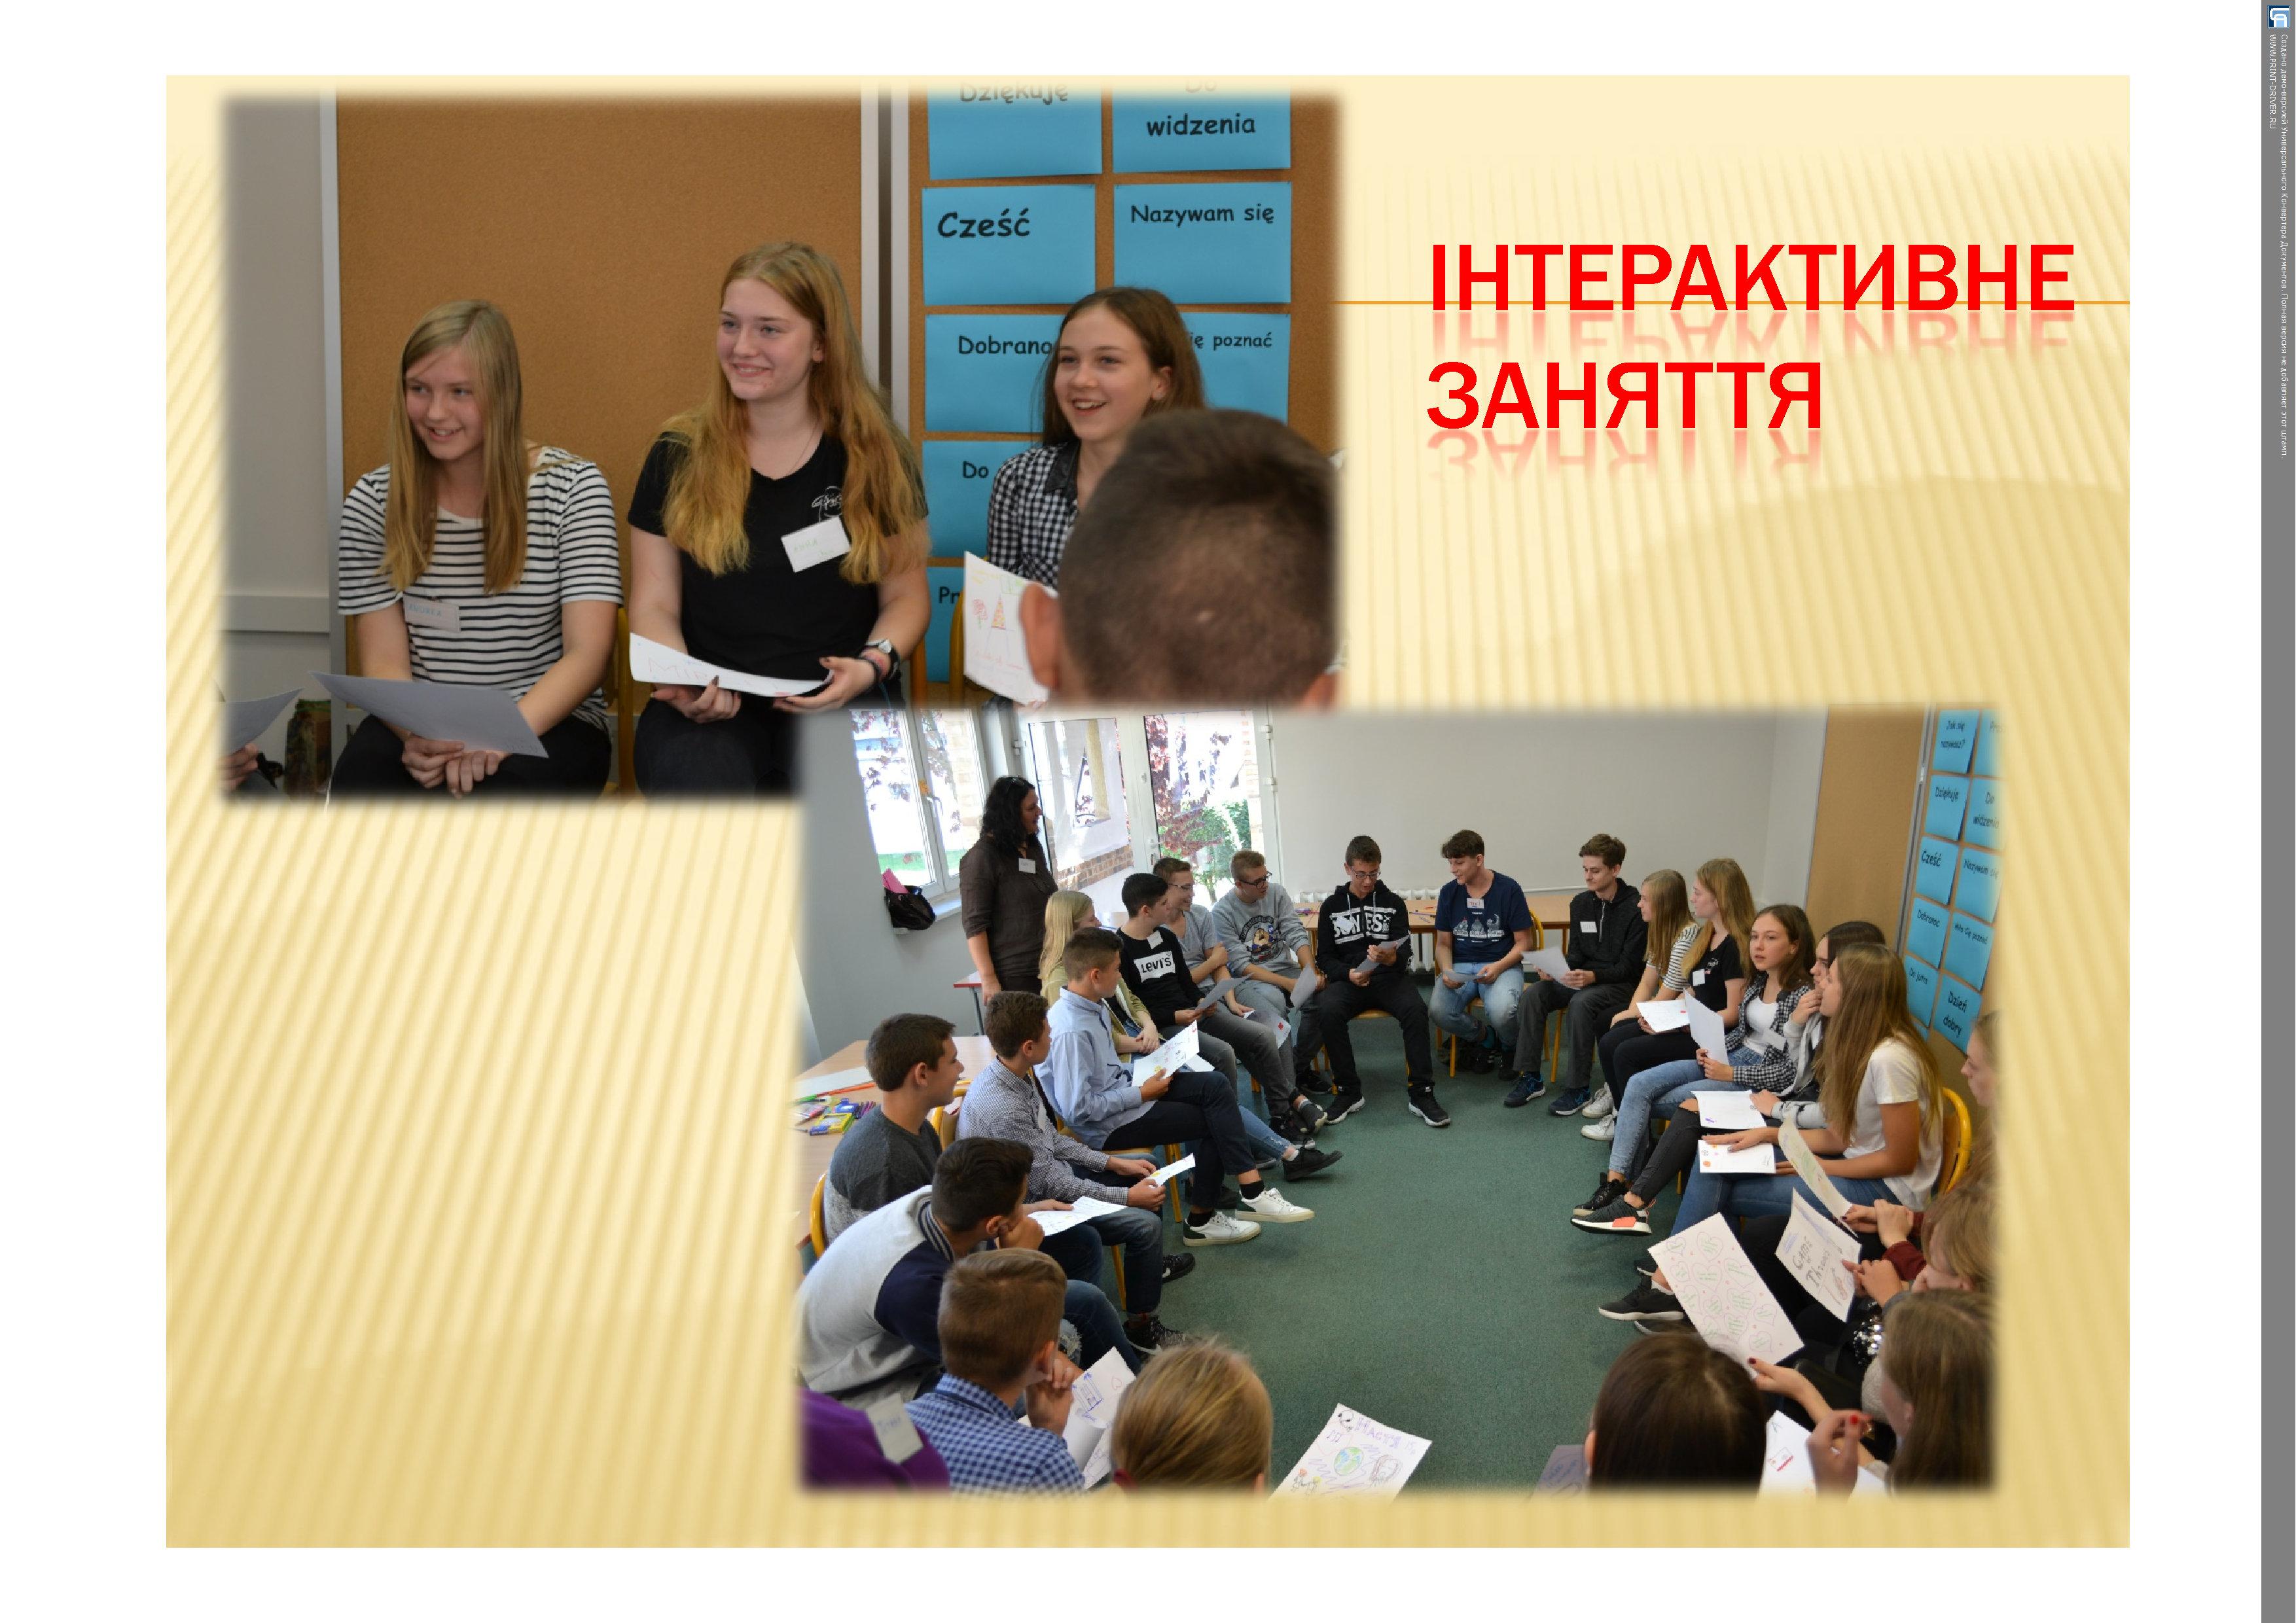 prezentacija-polshcha8